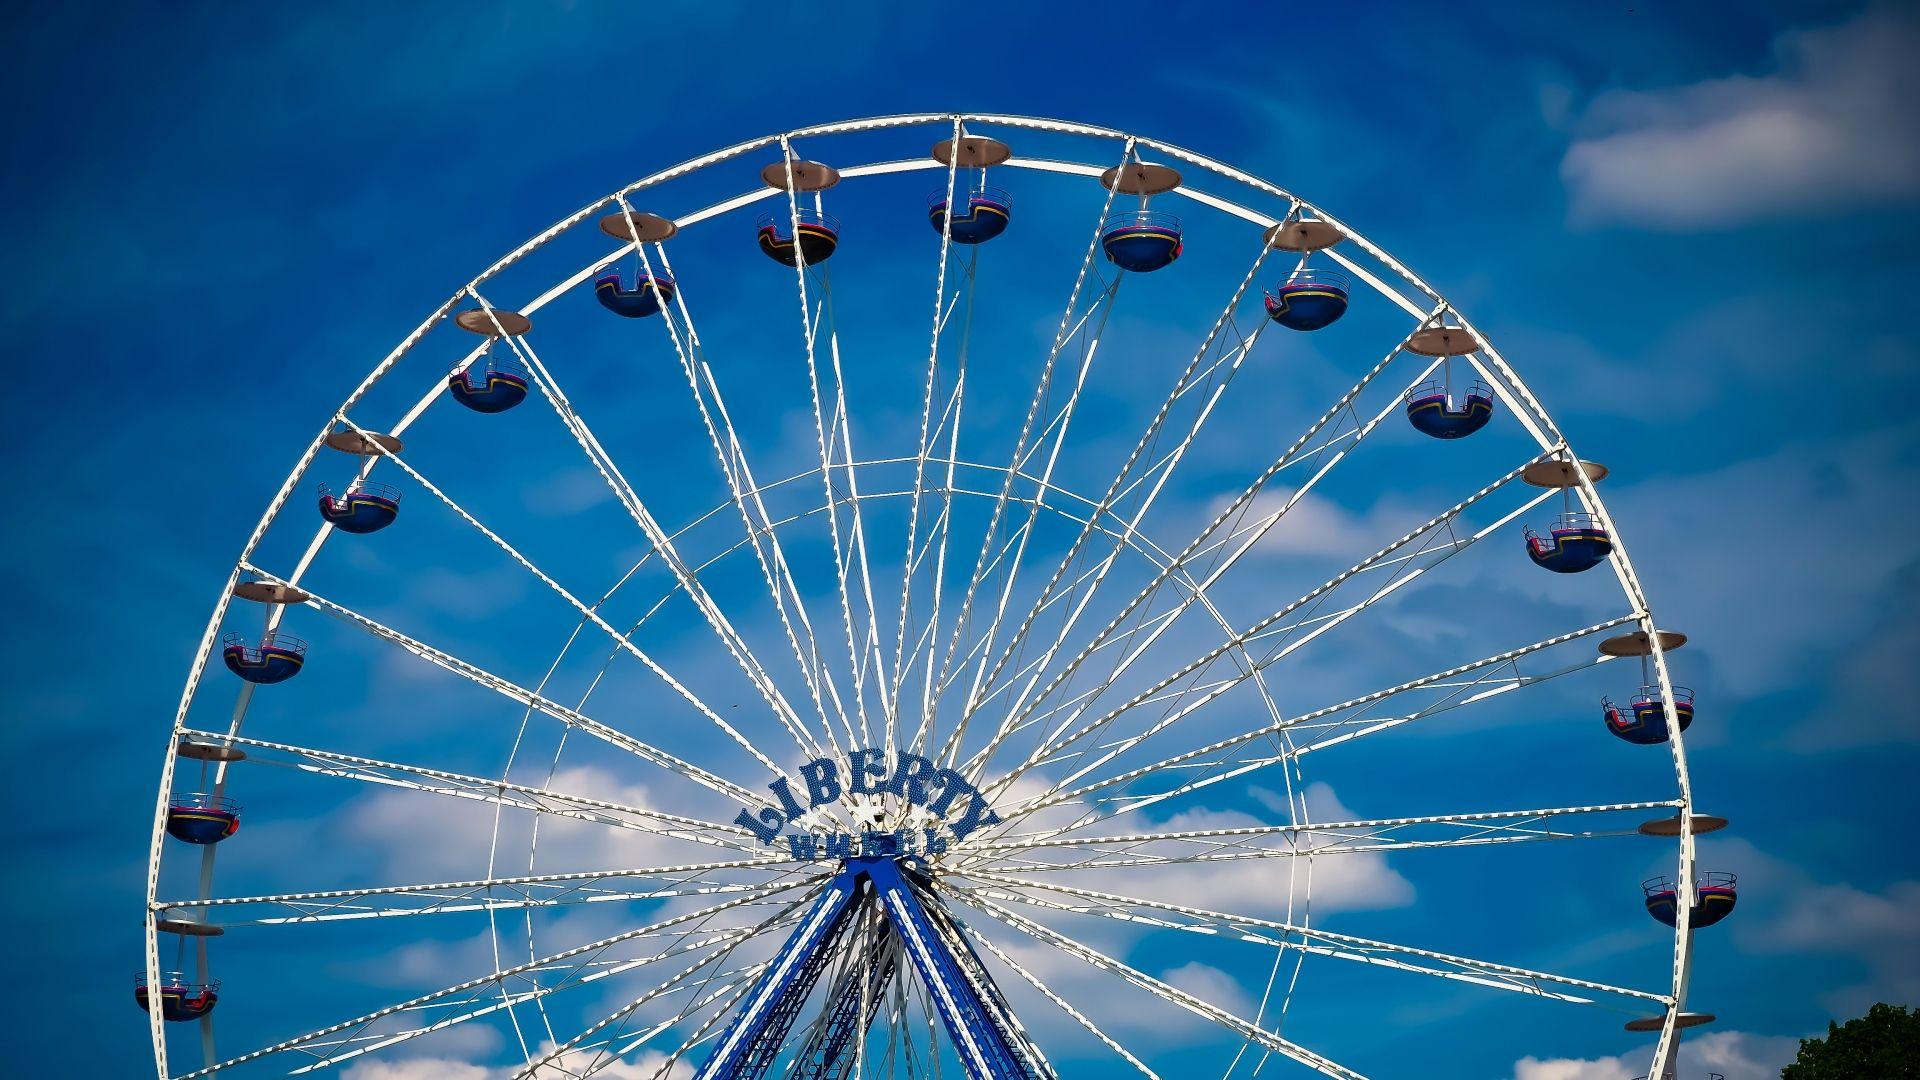 Awesome Ferris Wheel Ferris Wheel Background Images Wallpaper Backgrounds Hd wallpaper autumn ferris wheel park